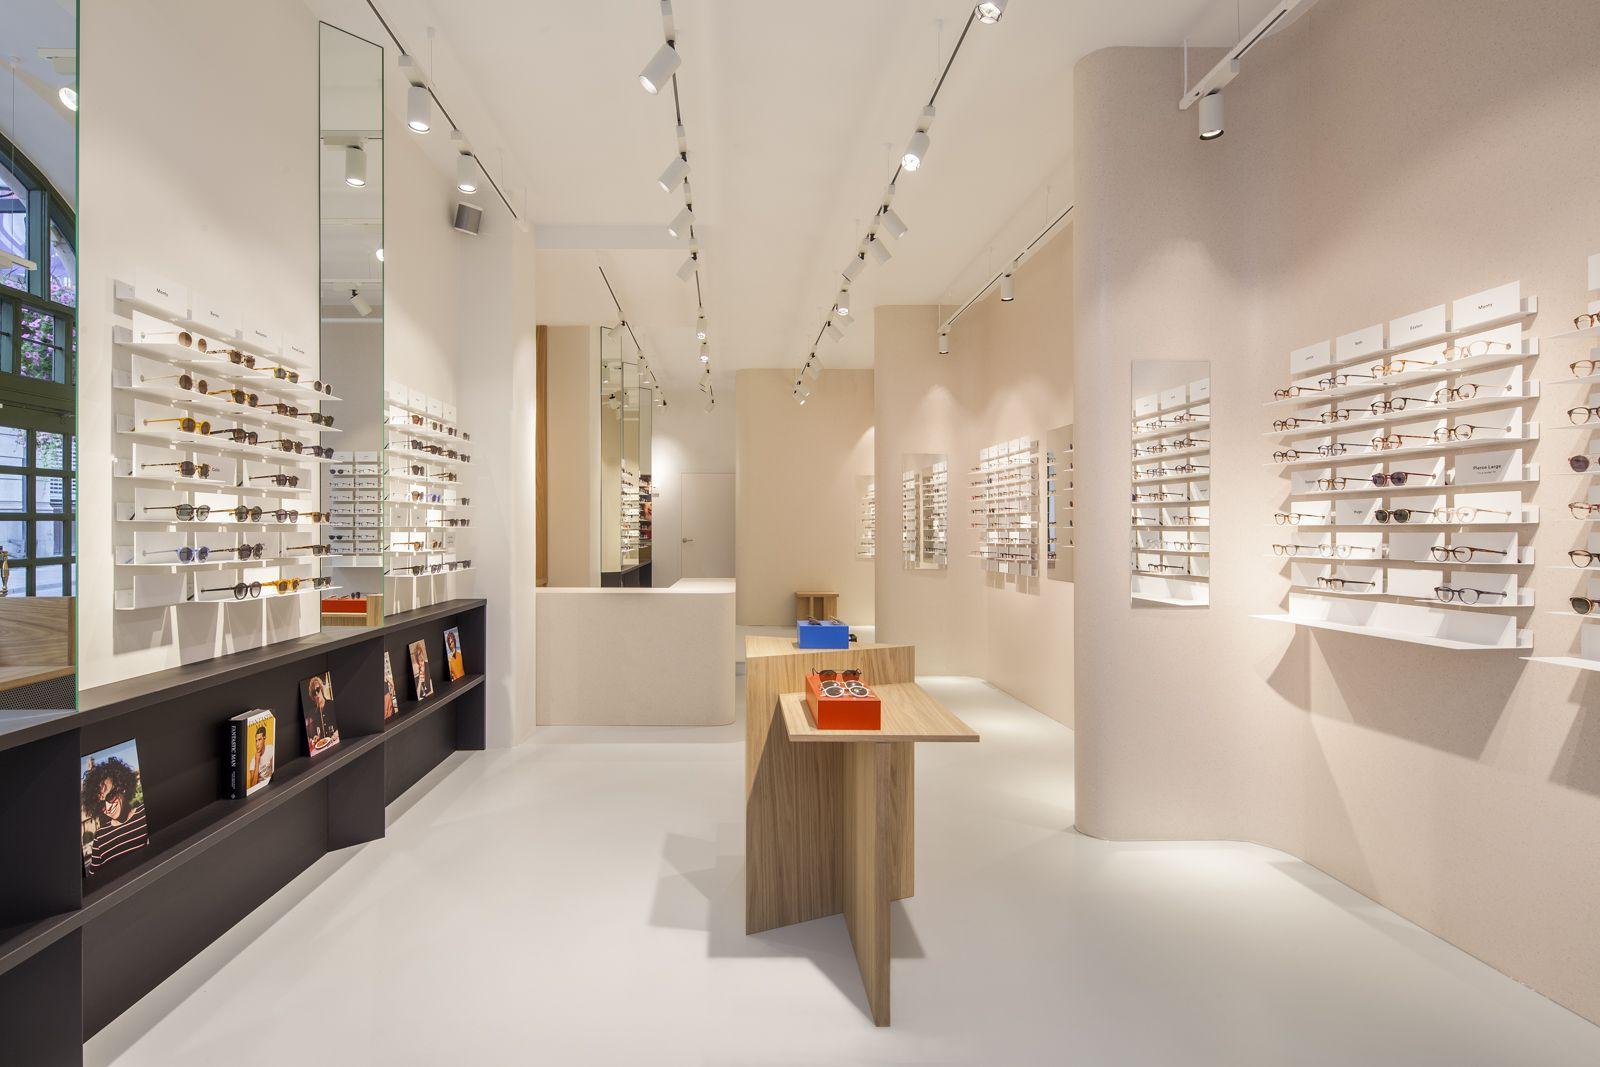 Ace Tate Store Master Samuelsgatan Stockholm Retail Store Design Design Store Design Showroom showcase eye candy